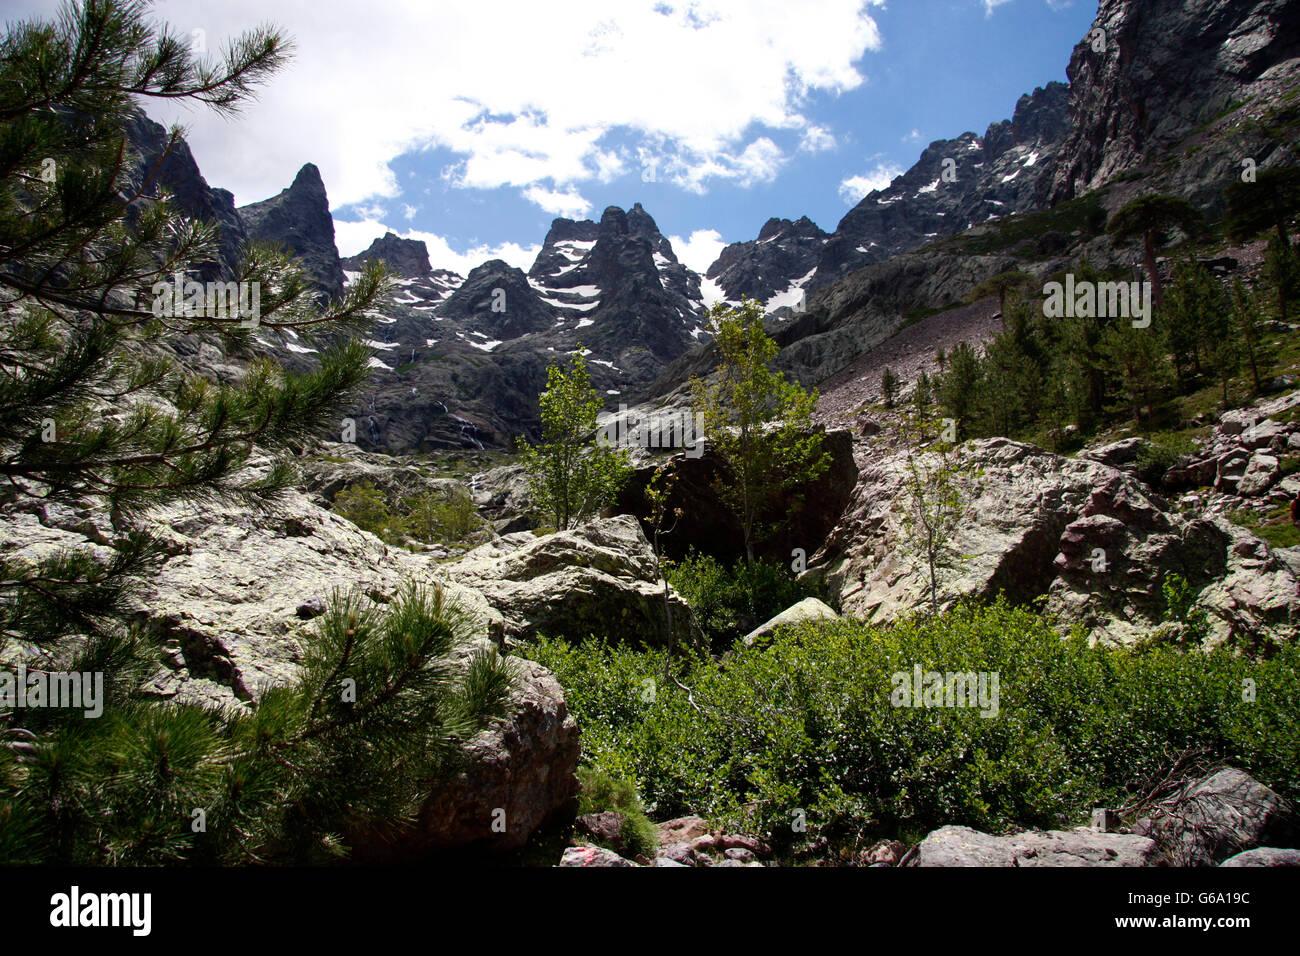 der hoechste Berg Korsikas, der Monte Cinto, Korsika, Frankreich. - Stock Image